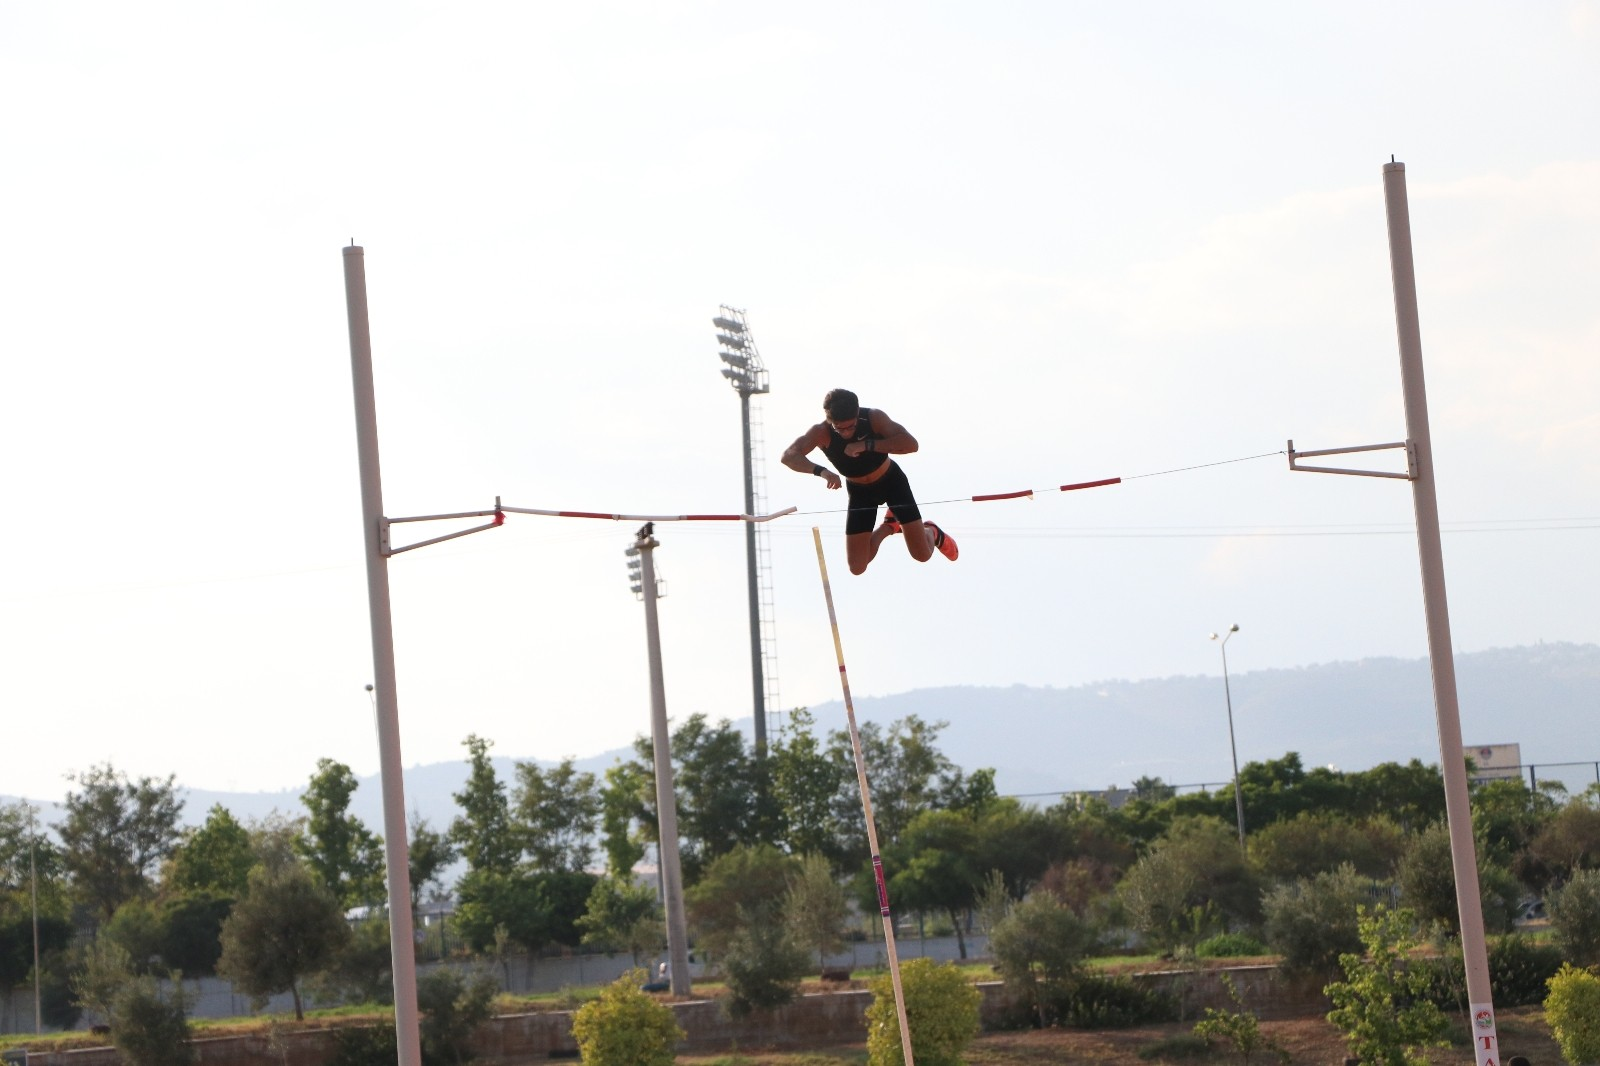 ozel haber ersu sasmanin yeni hedefi olimpiyatta madalya